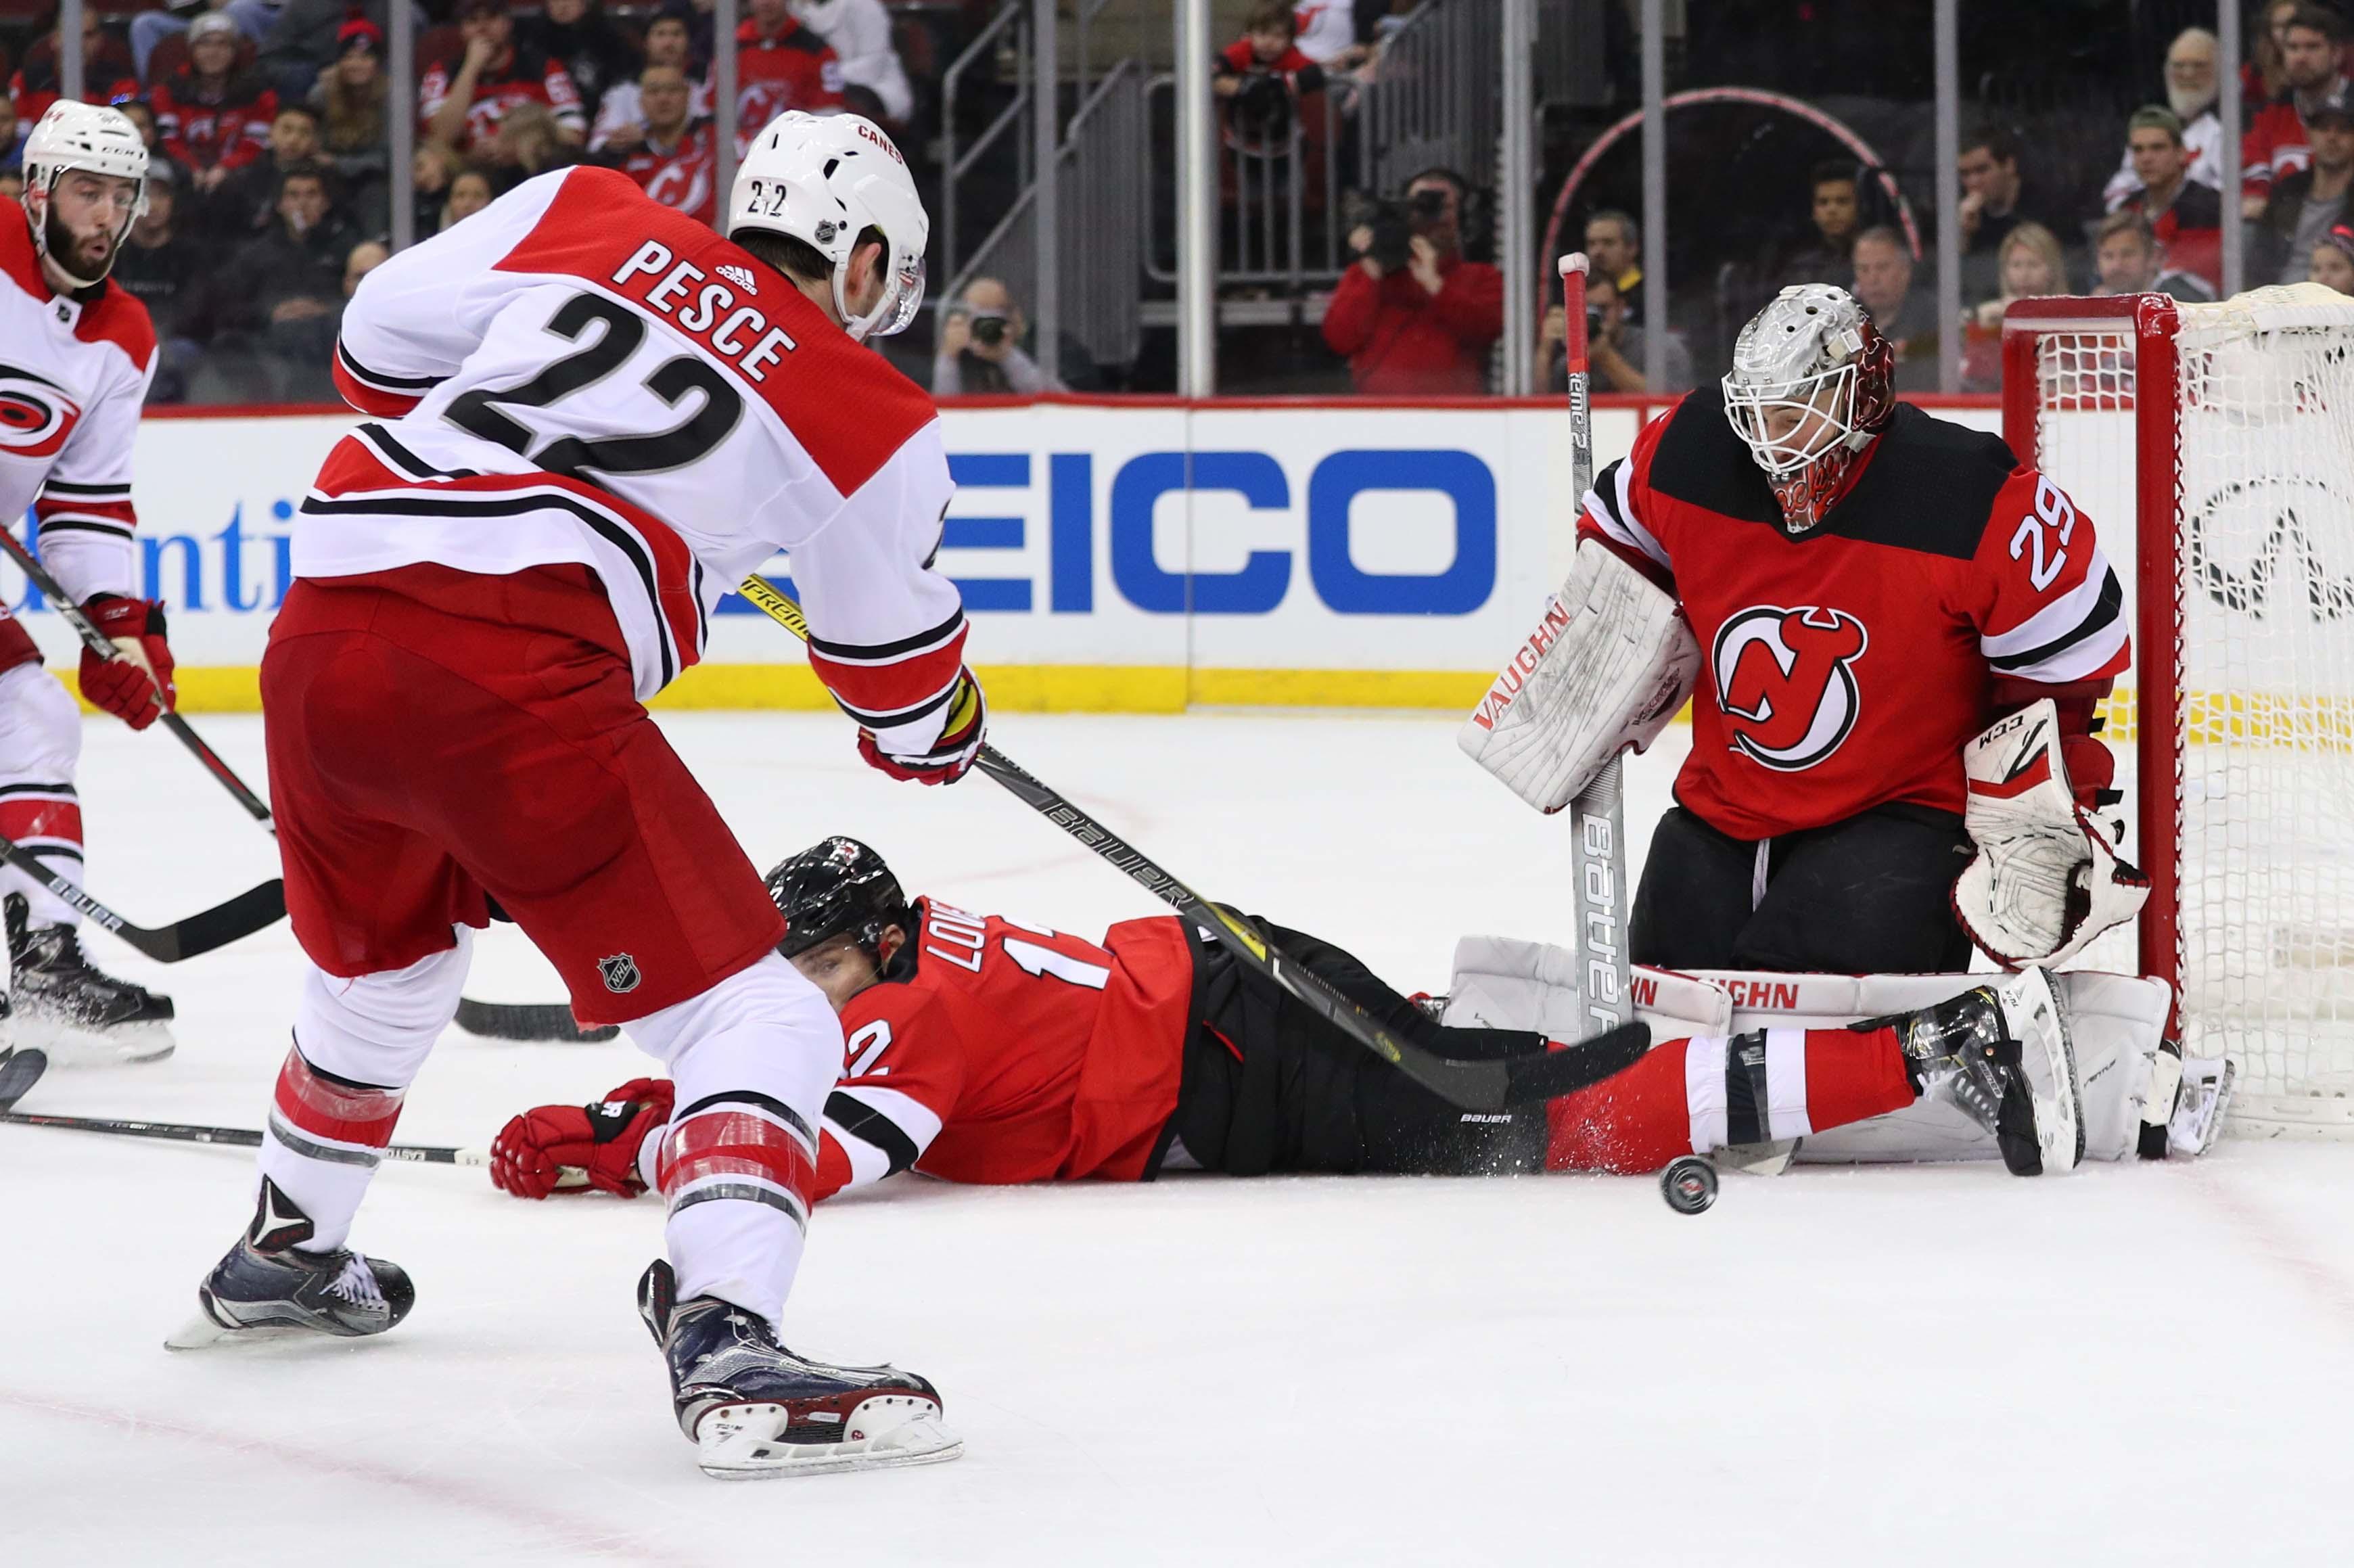 NHL: Carolina Hurricanes at New Jersey Devils